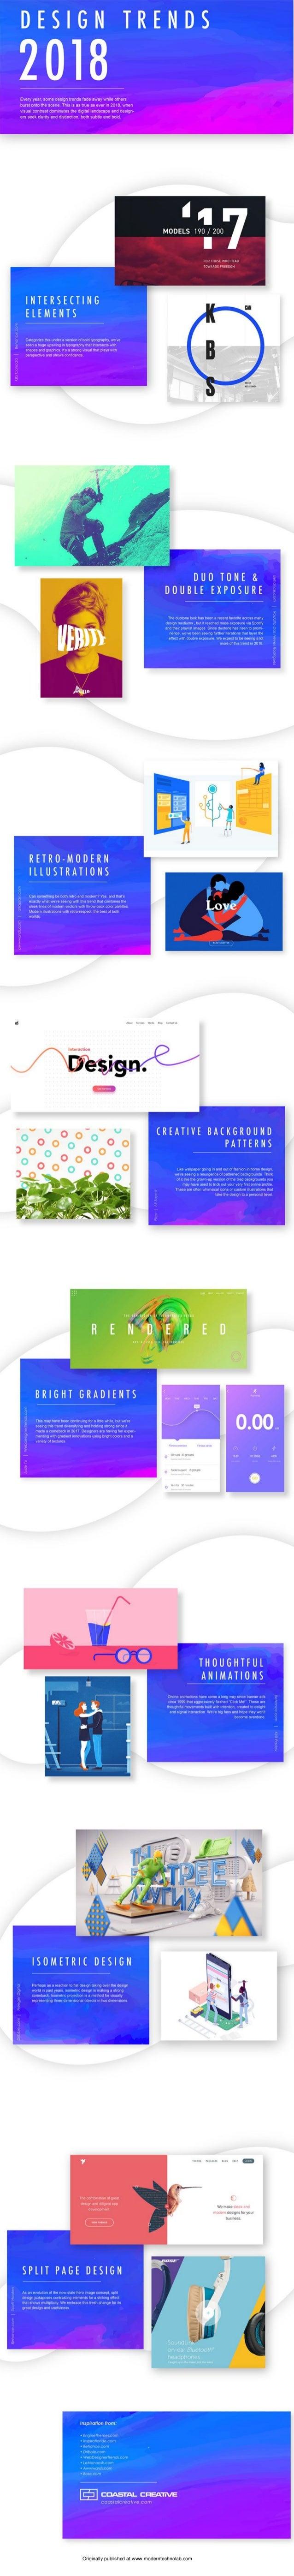 Originally published at www.moderntechnolab.com